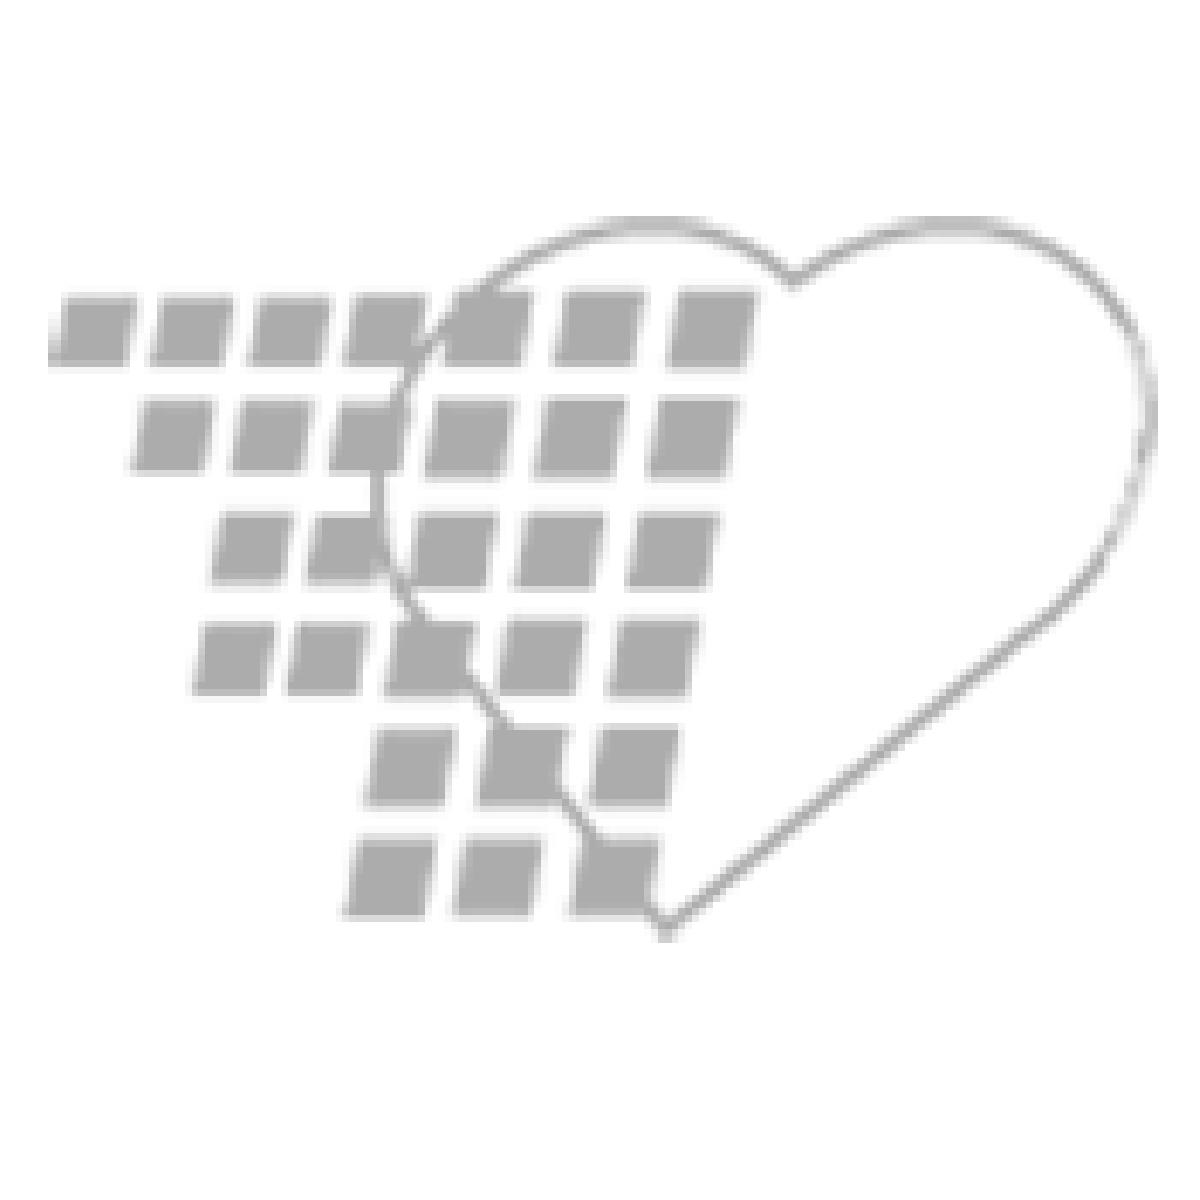 06-93-0426 - Demo Dose® 10% Lipids IV Fluid 500 mL